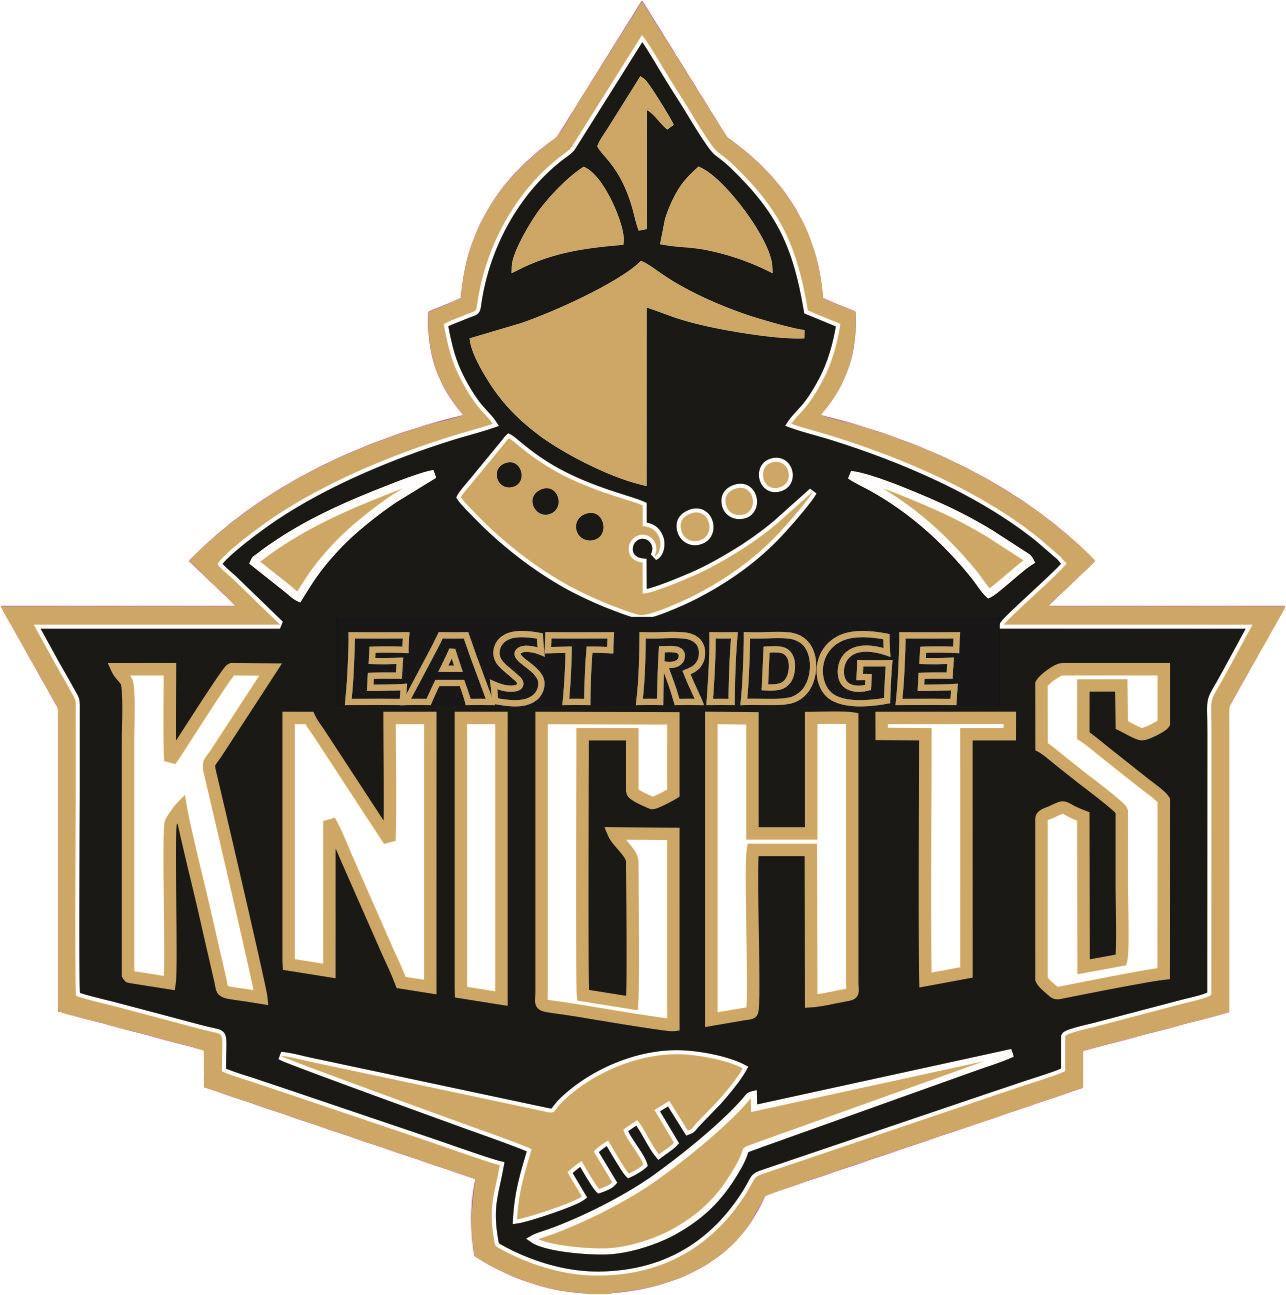 MFPW - East Ridge Knights - Unlimited